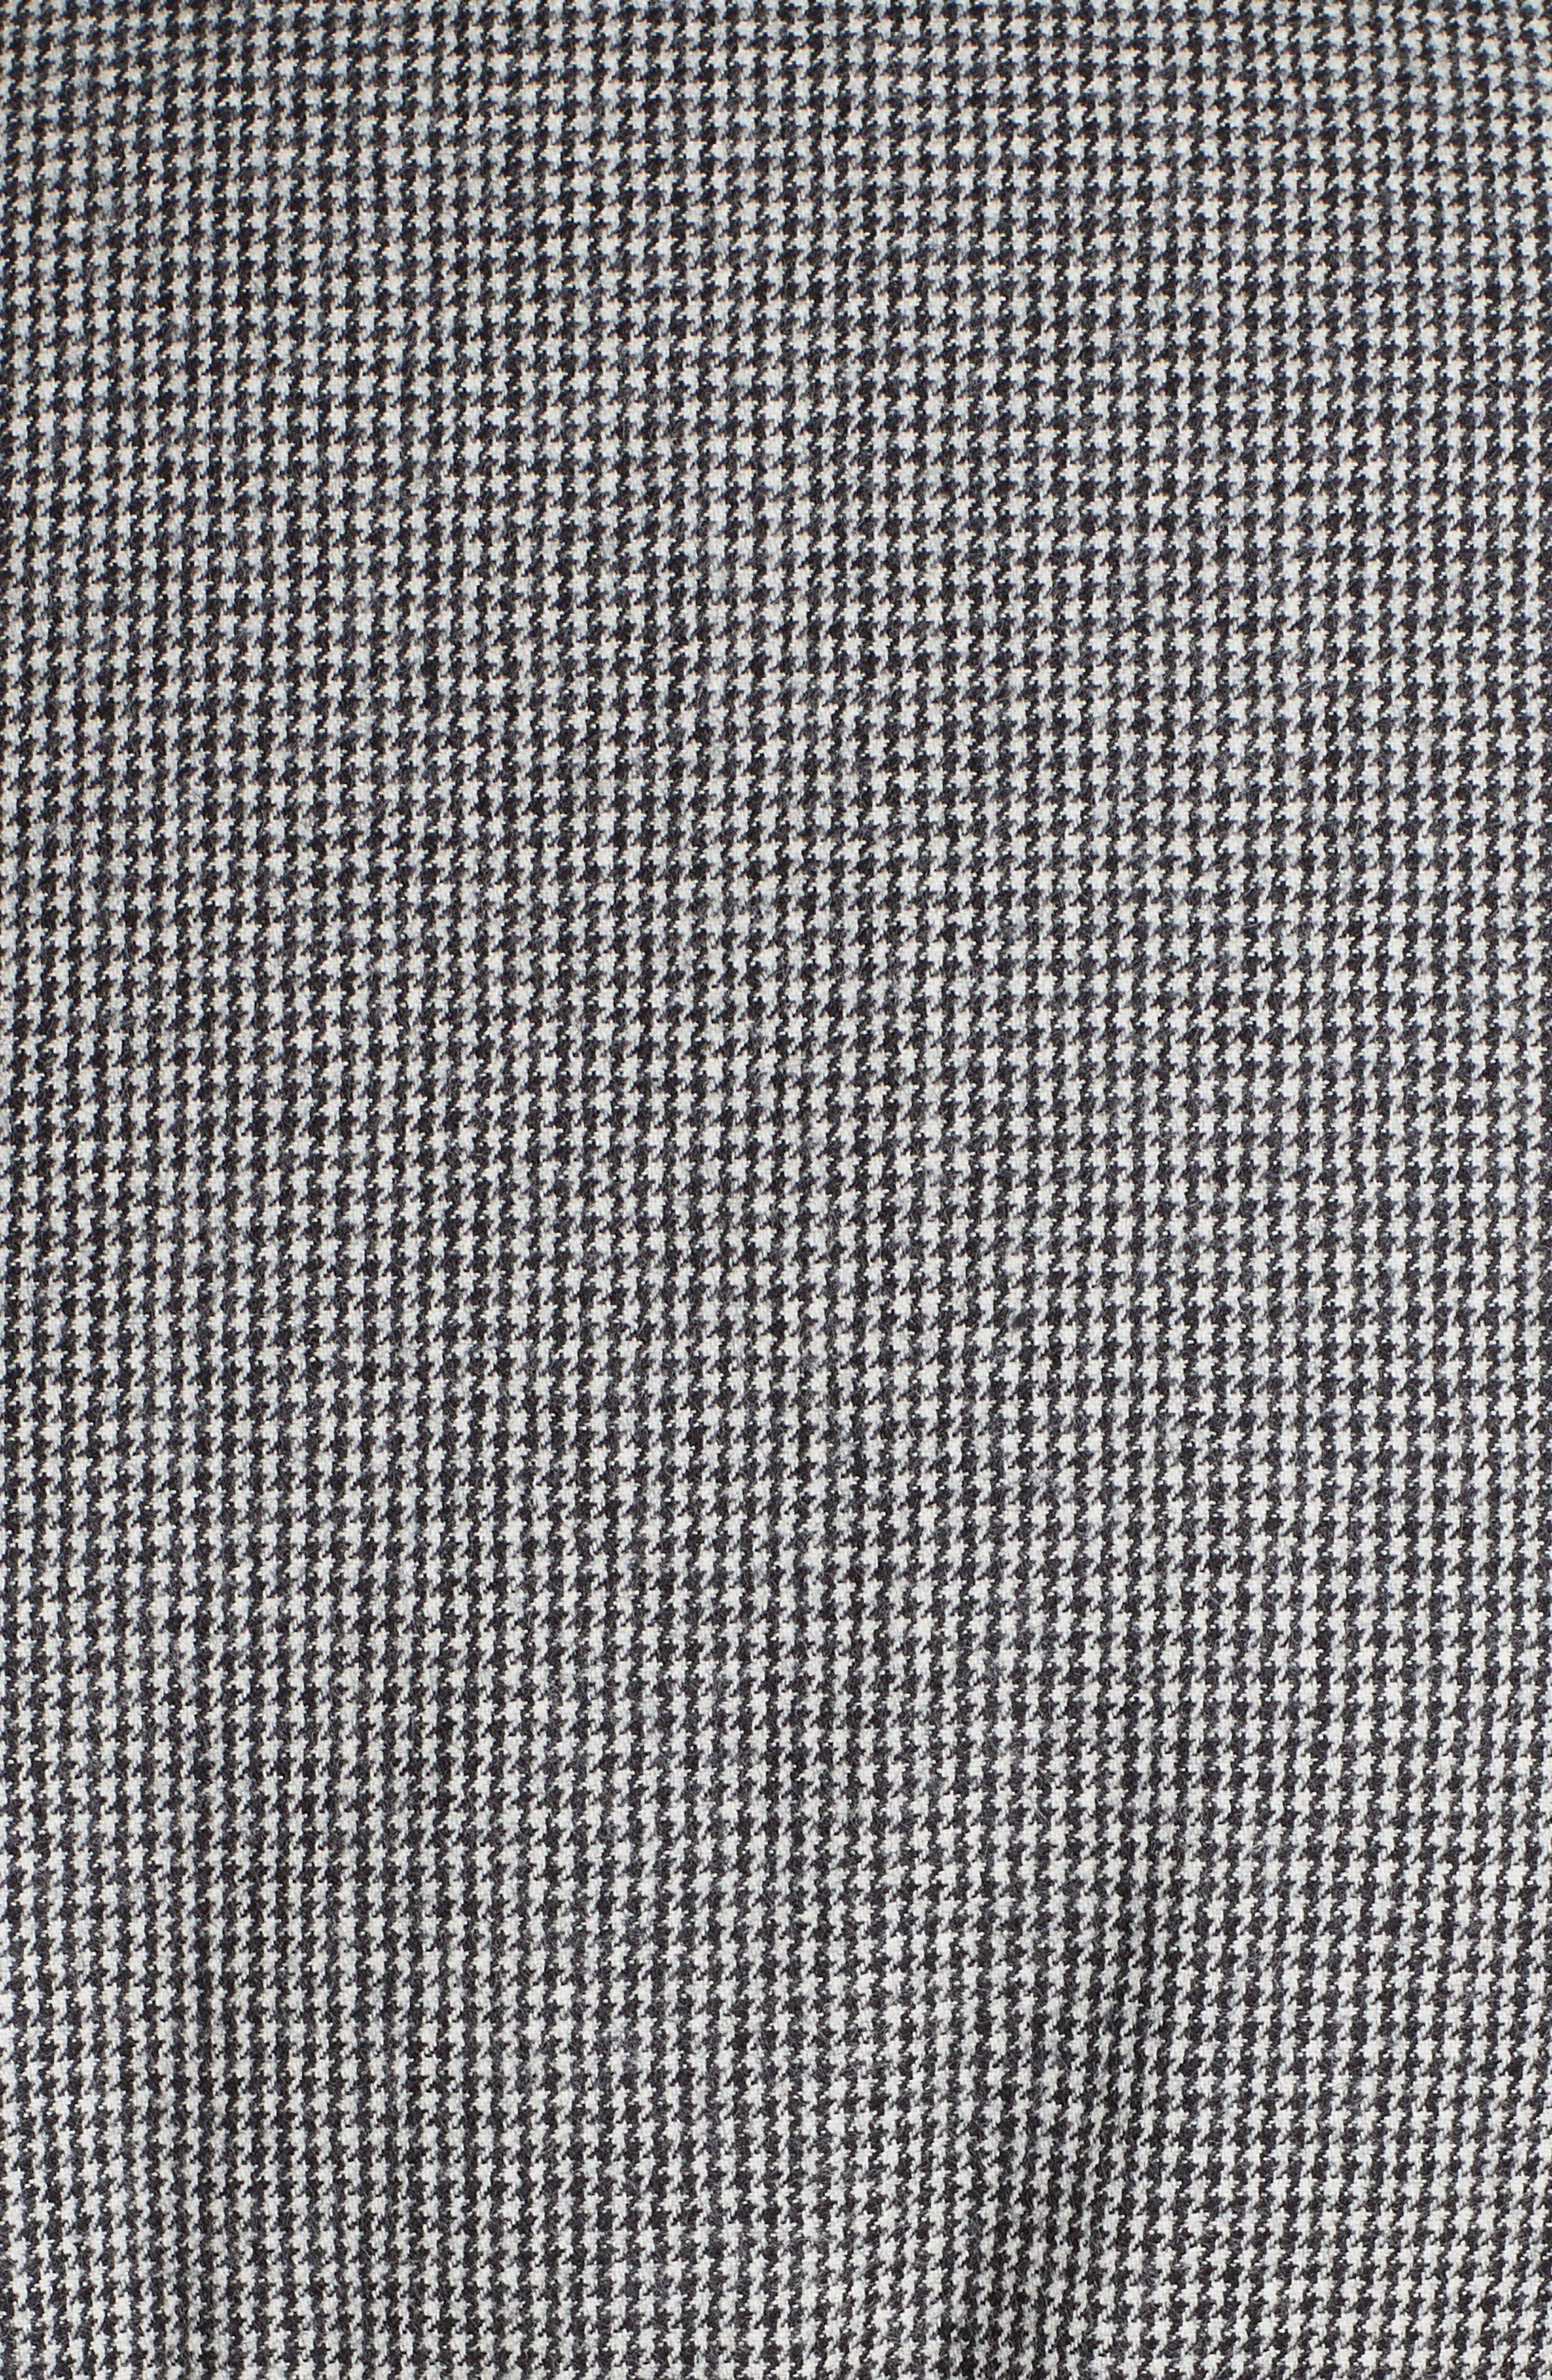 MONCLER,                             Cer Wool Down Puffer Jacket,                             Alternate thumbnail 6, color,                             BLACK